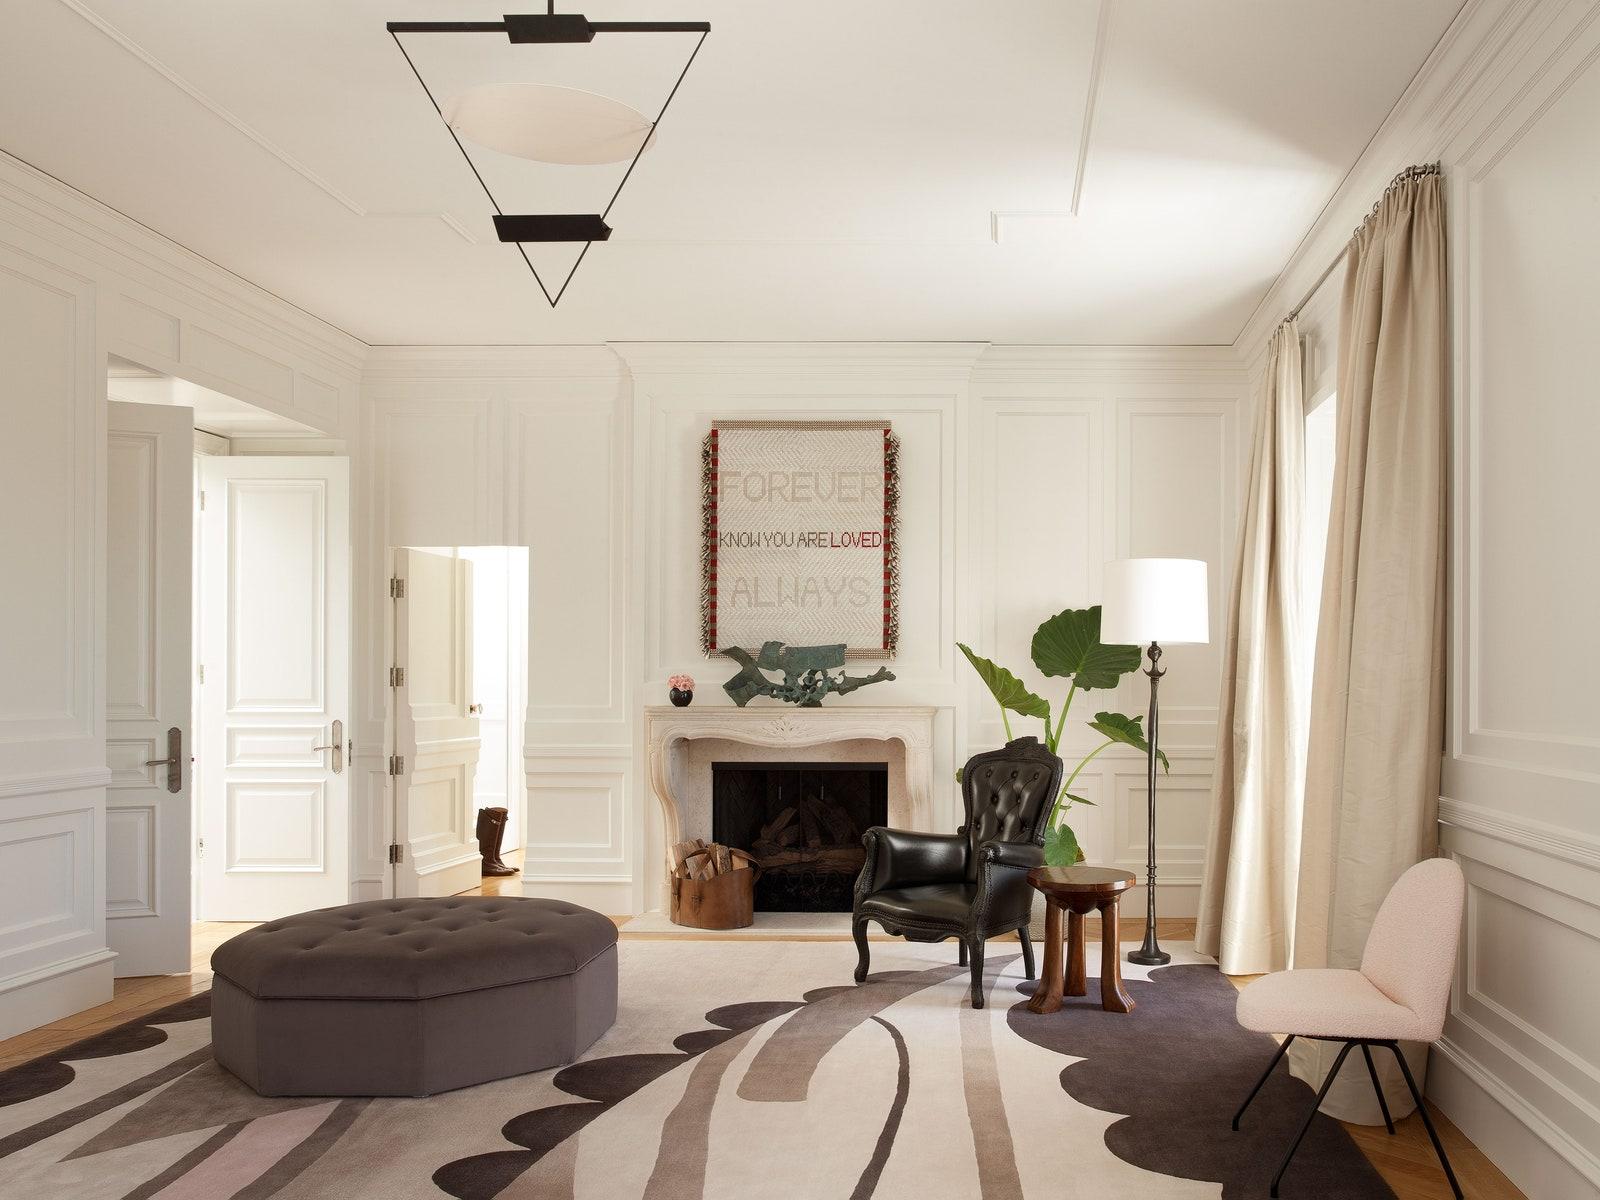 Tyler Ellis's Chic New Home Designed By William Hefner